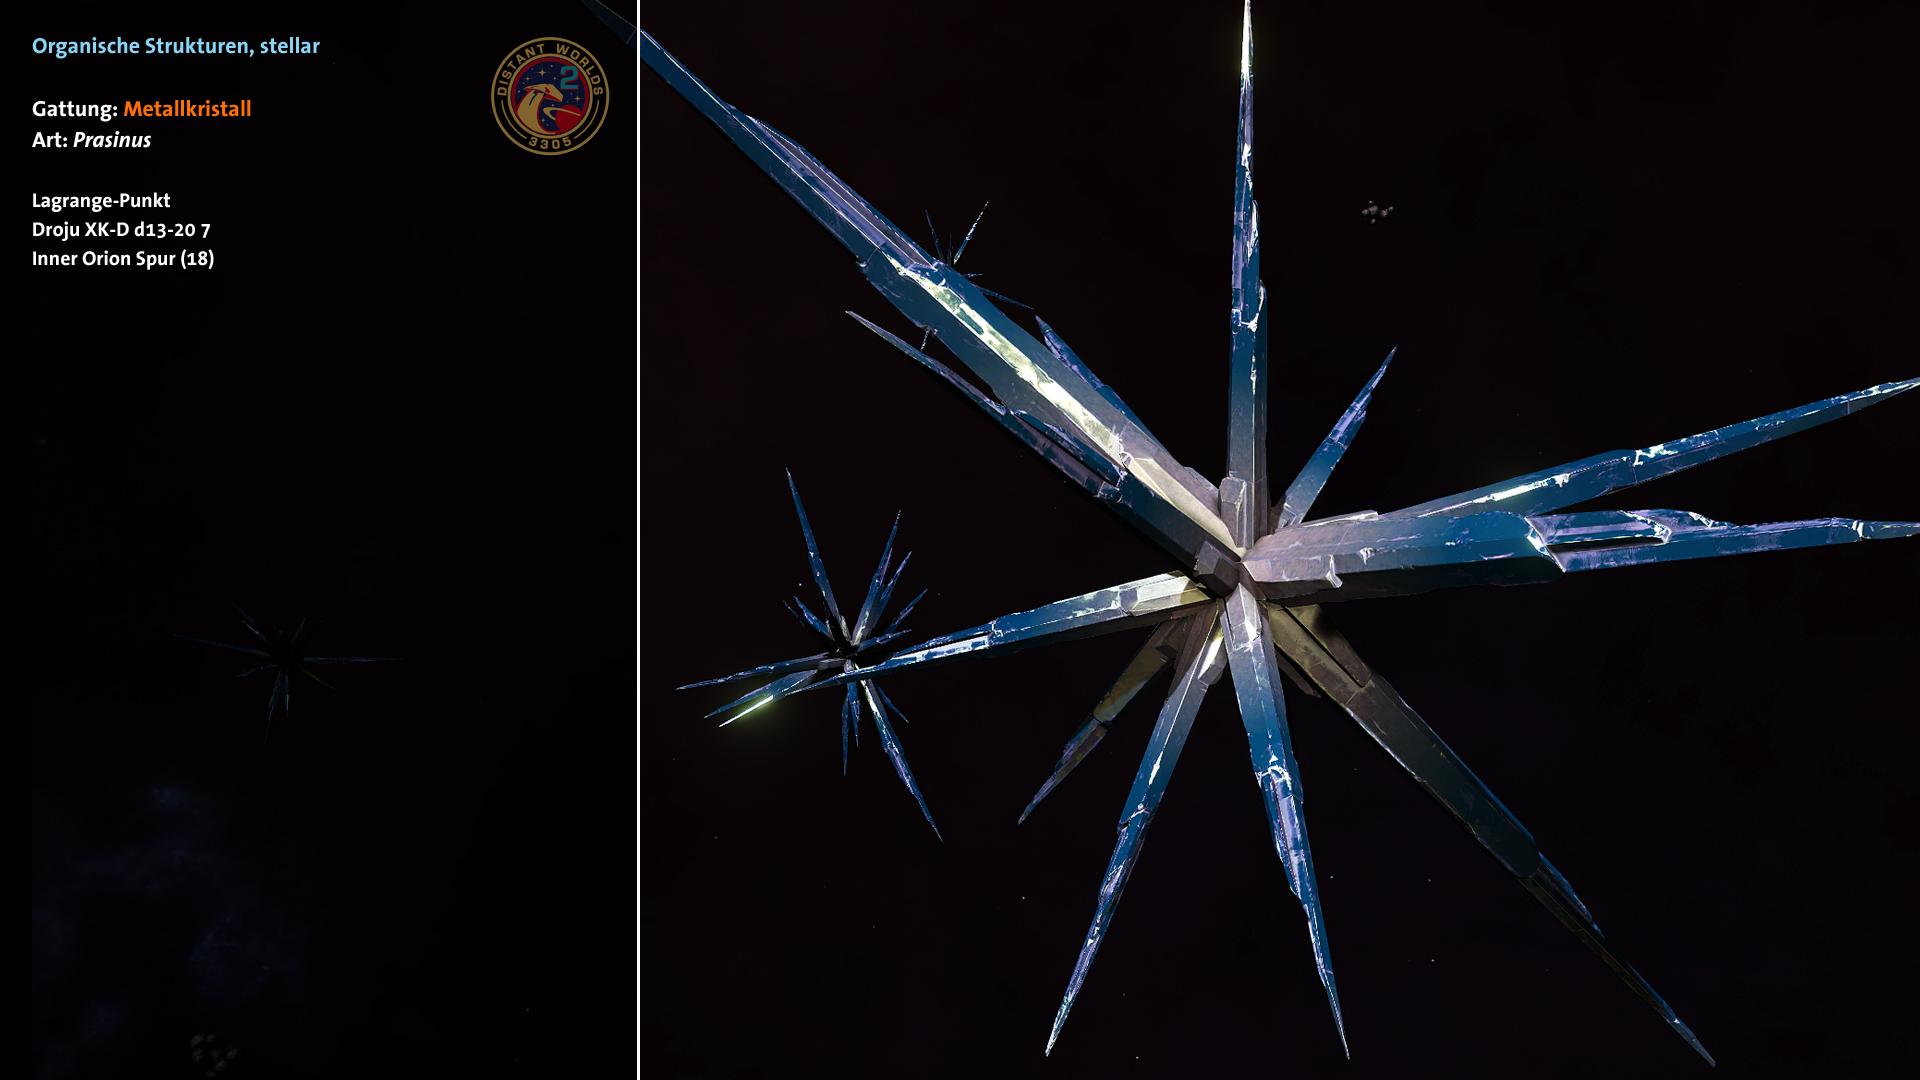 dw2-01-017-biostellar.jpg